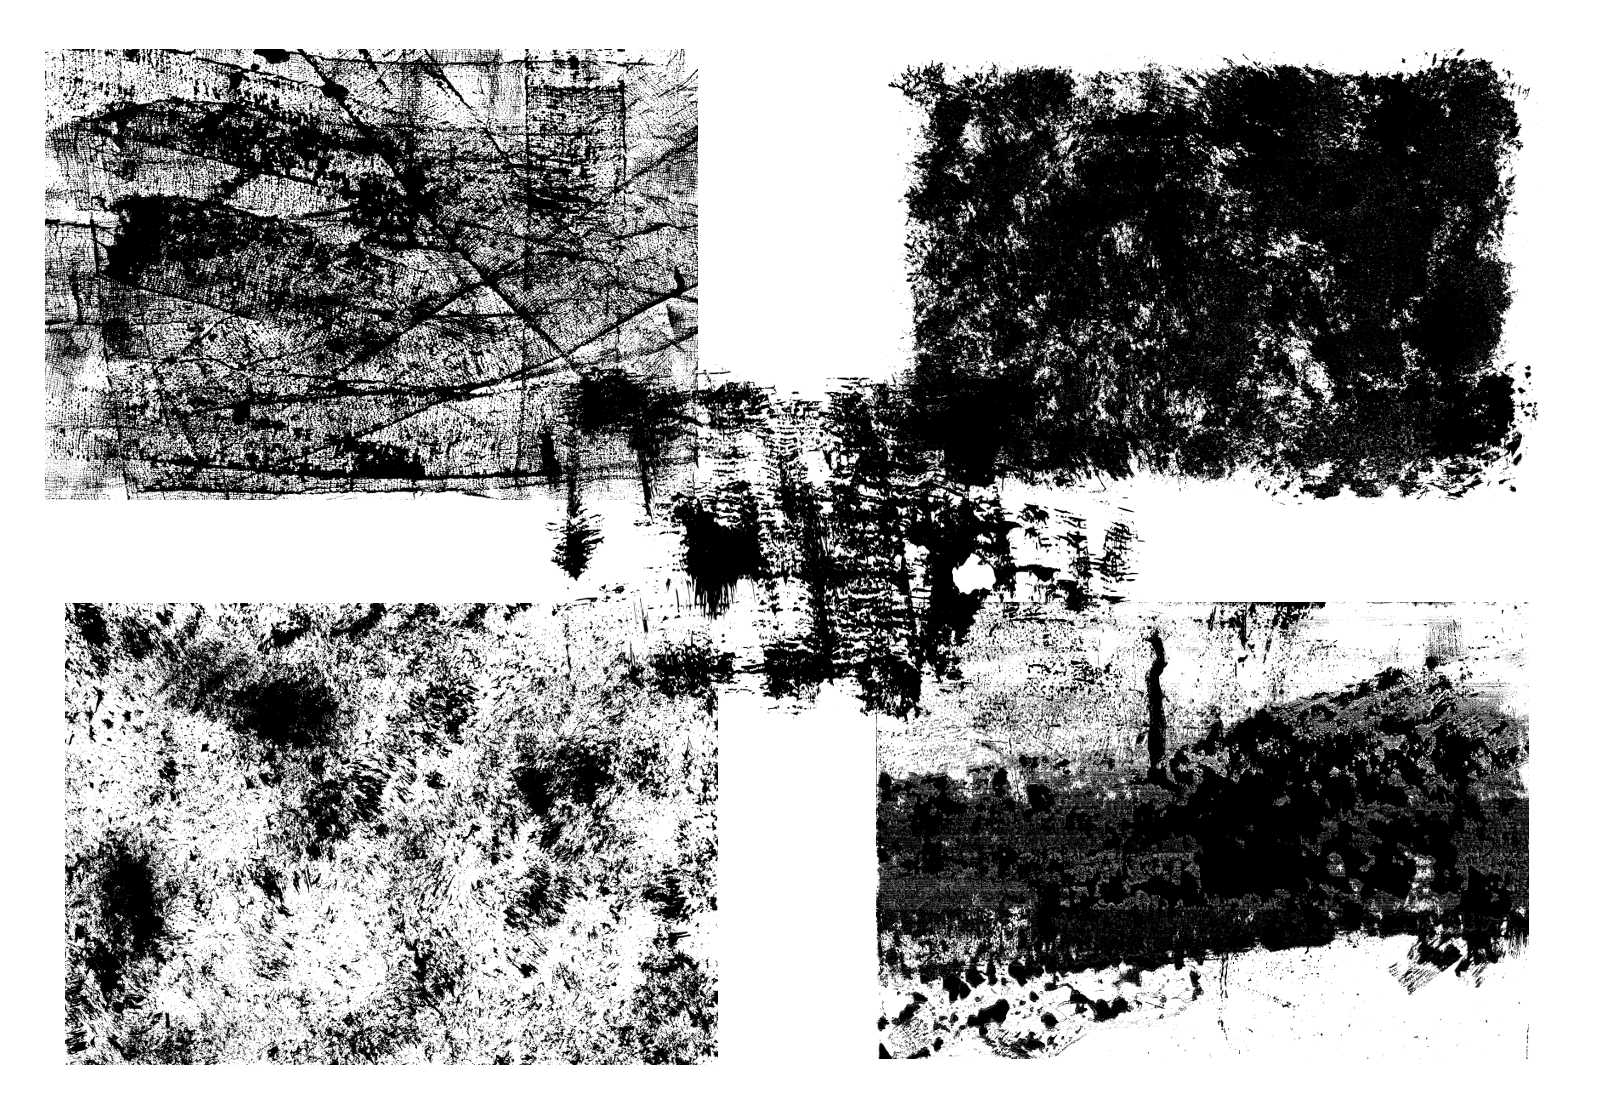 5 Grunge Overlay Textures (PNG Transparent)   OnlyGFX com